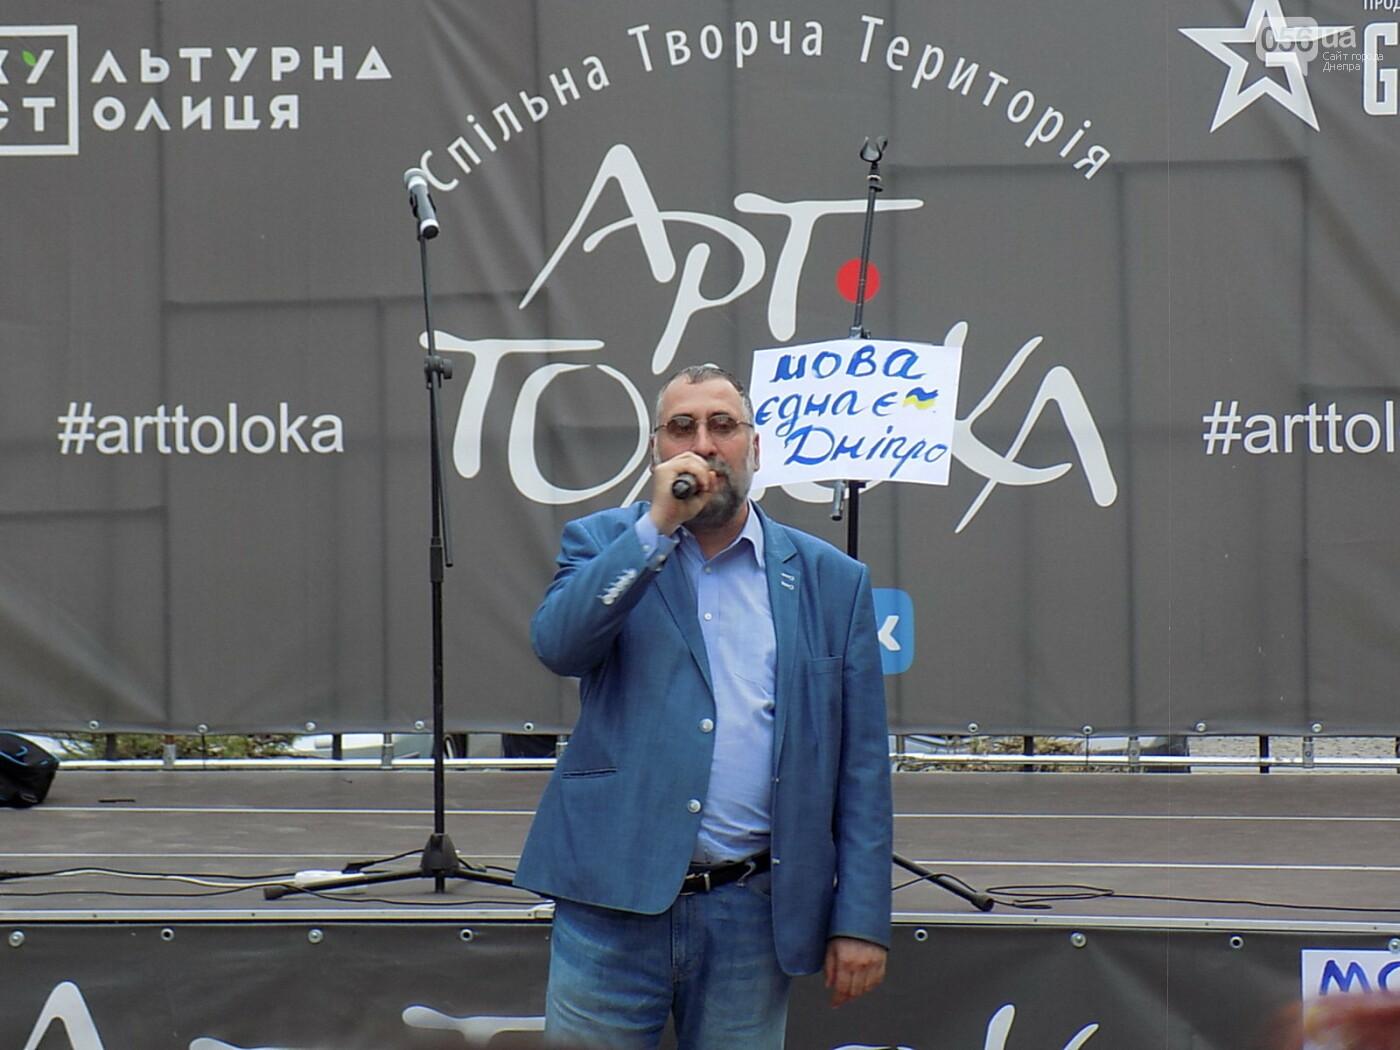 """Мова єднає Дніпро"": в центре города прошла символическая акция с концертом и подарками, - ФОТО, фото-14"